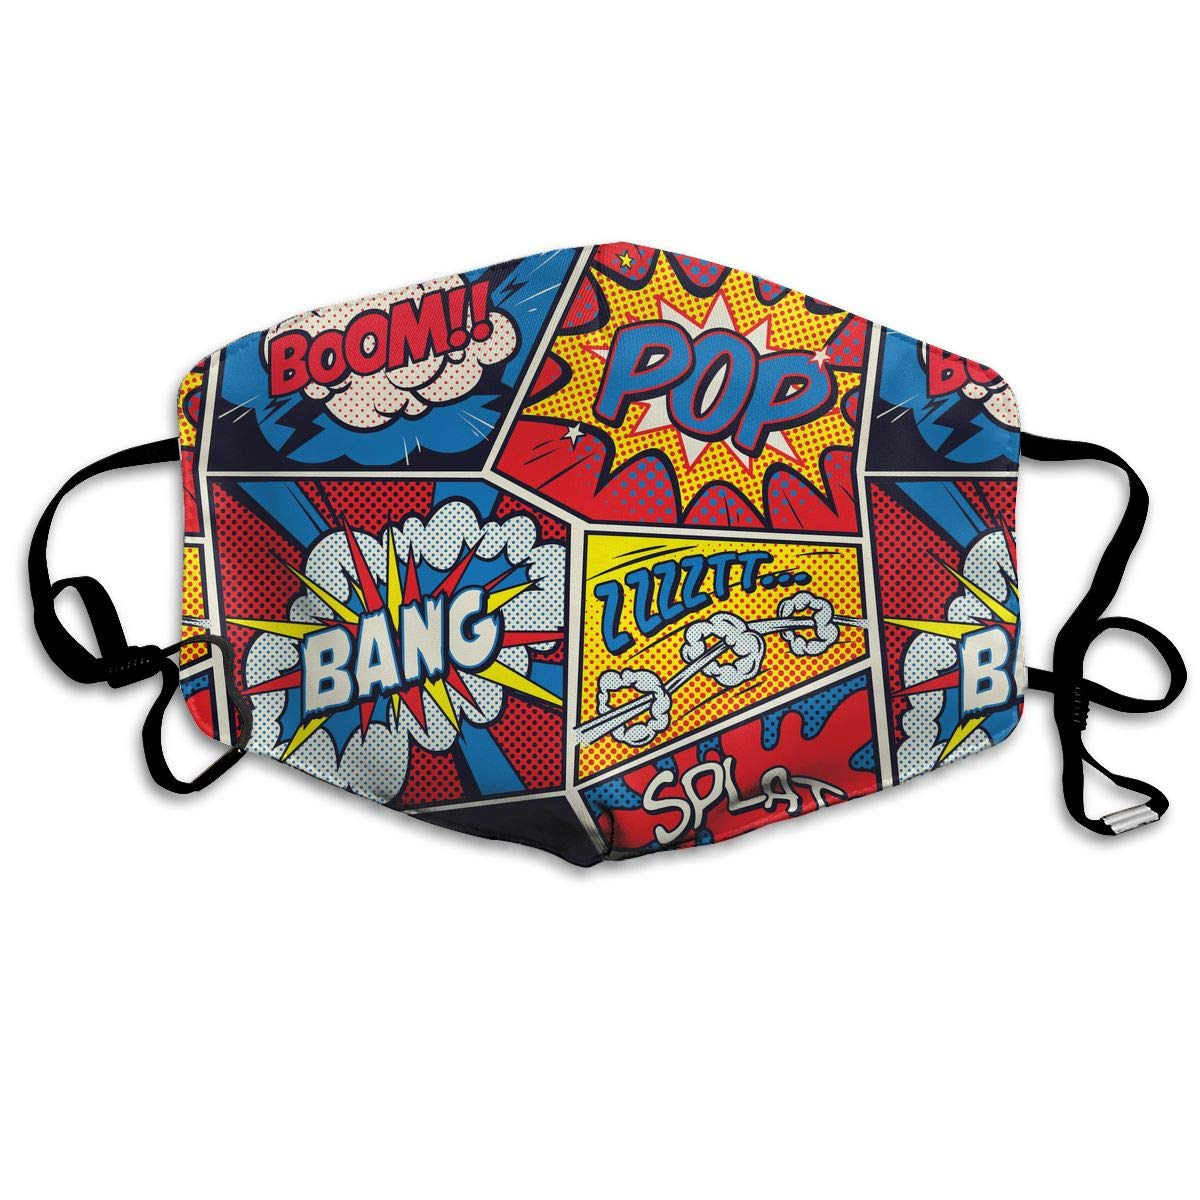 Retro Pop Art Comic Shout Washable Reusable   Mask, Cotton Anti Dust Half Face Mouth Mask For Kids Teens Men Women With